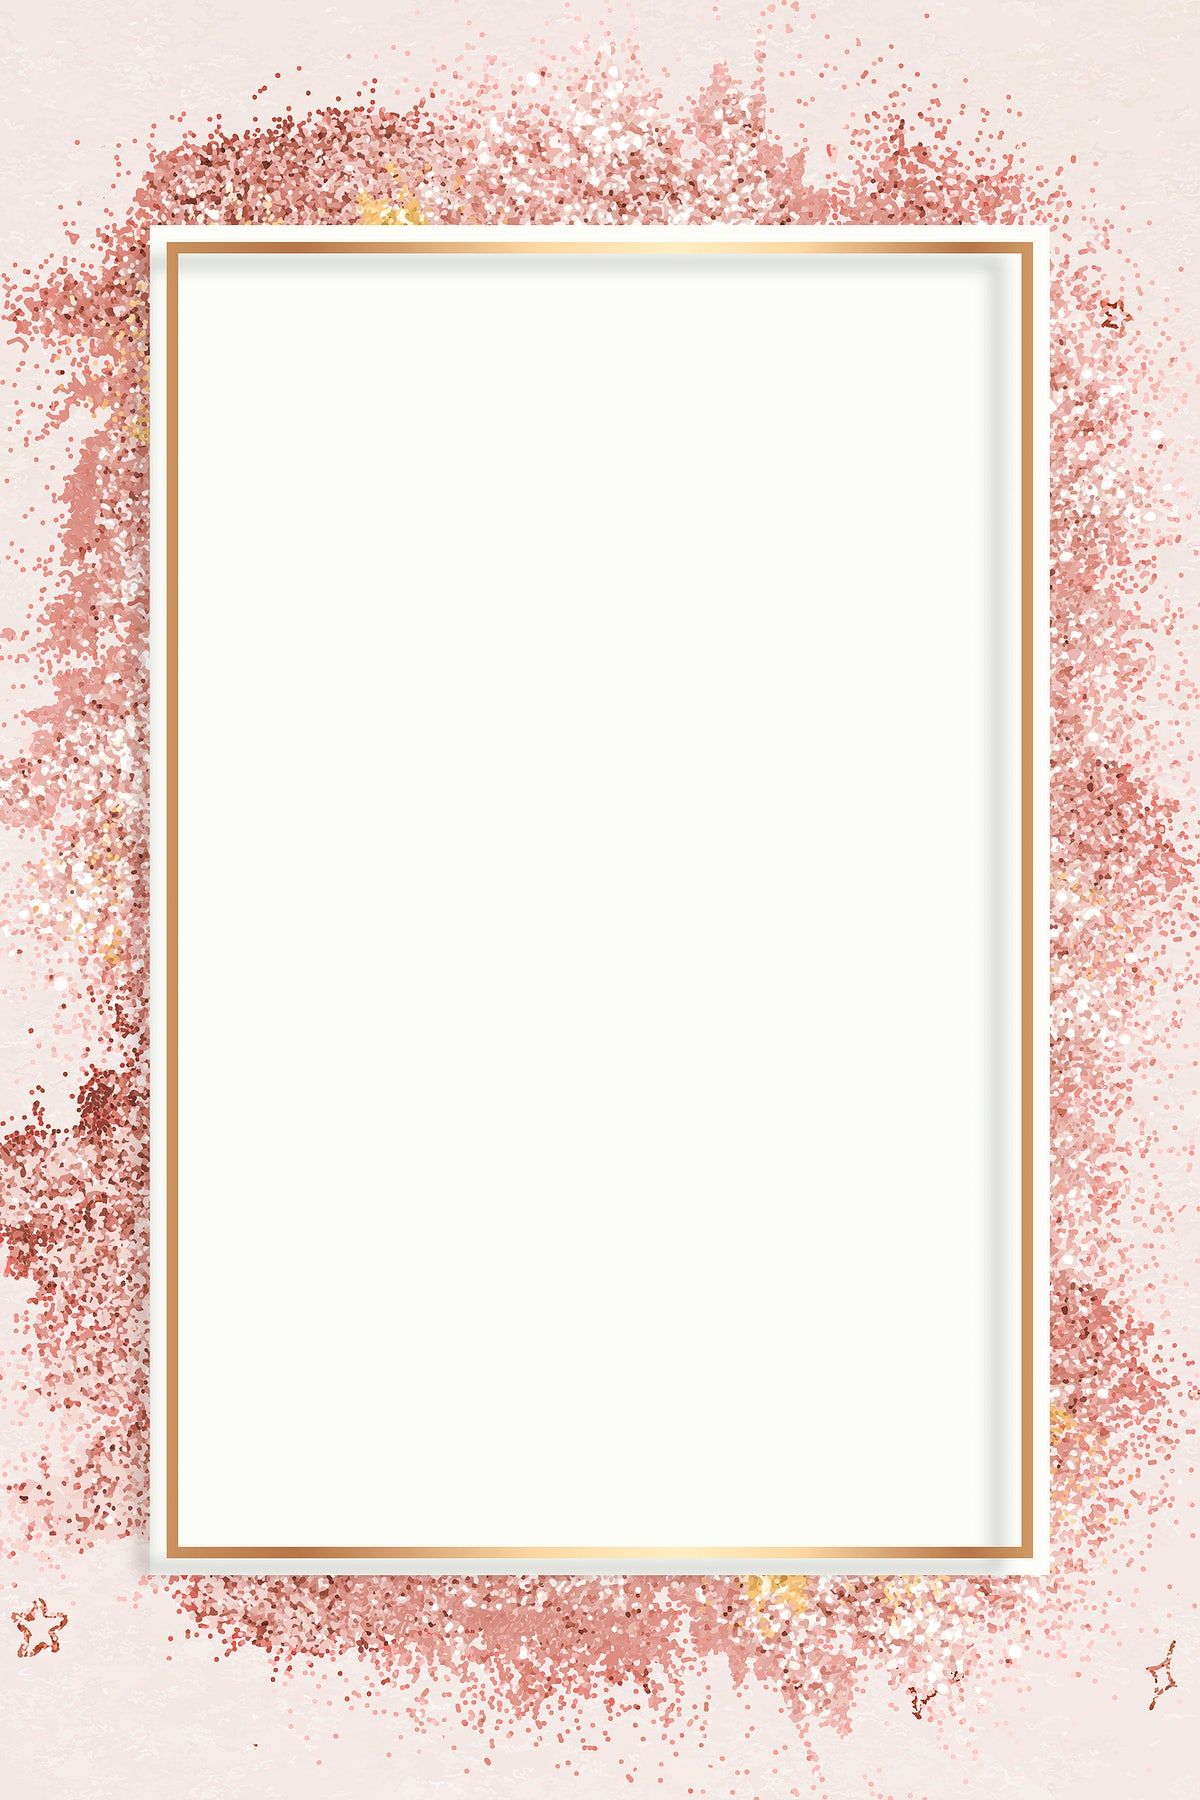 Download Premium Vector Of Rose Gold Glitter Frame Vector Pink Festive Gold Glitter Background Glitter Frame Rose Gold Backgrounds